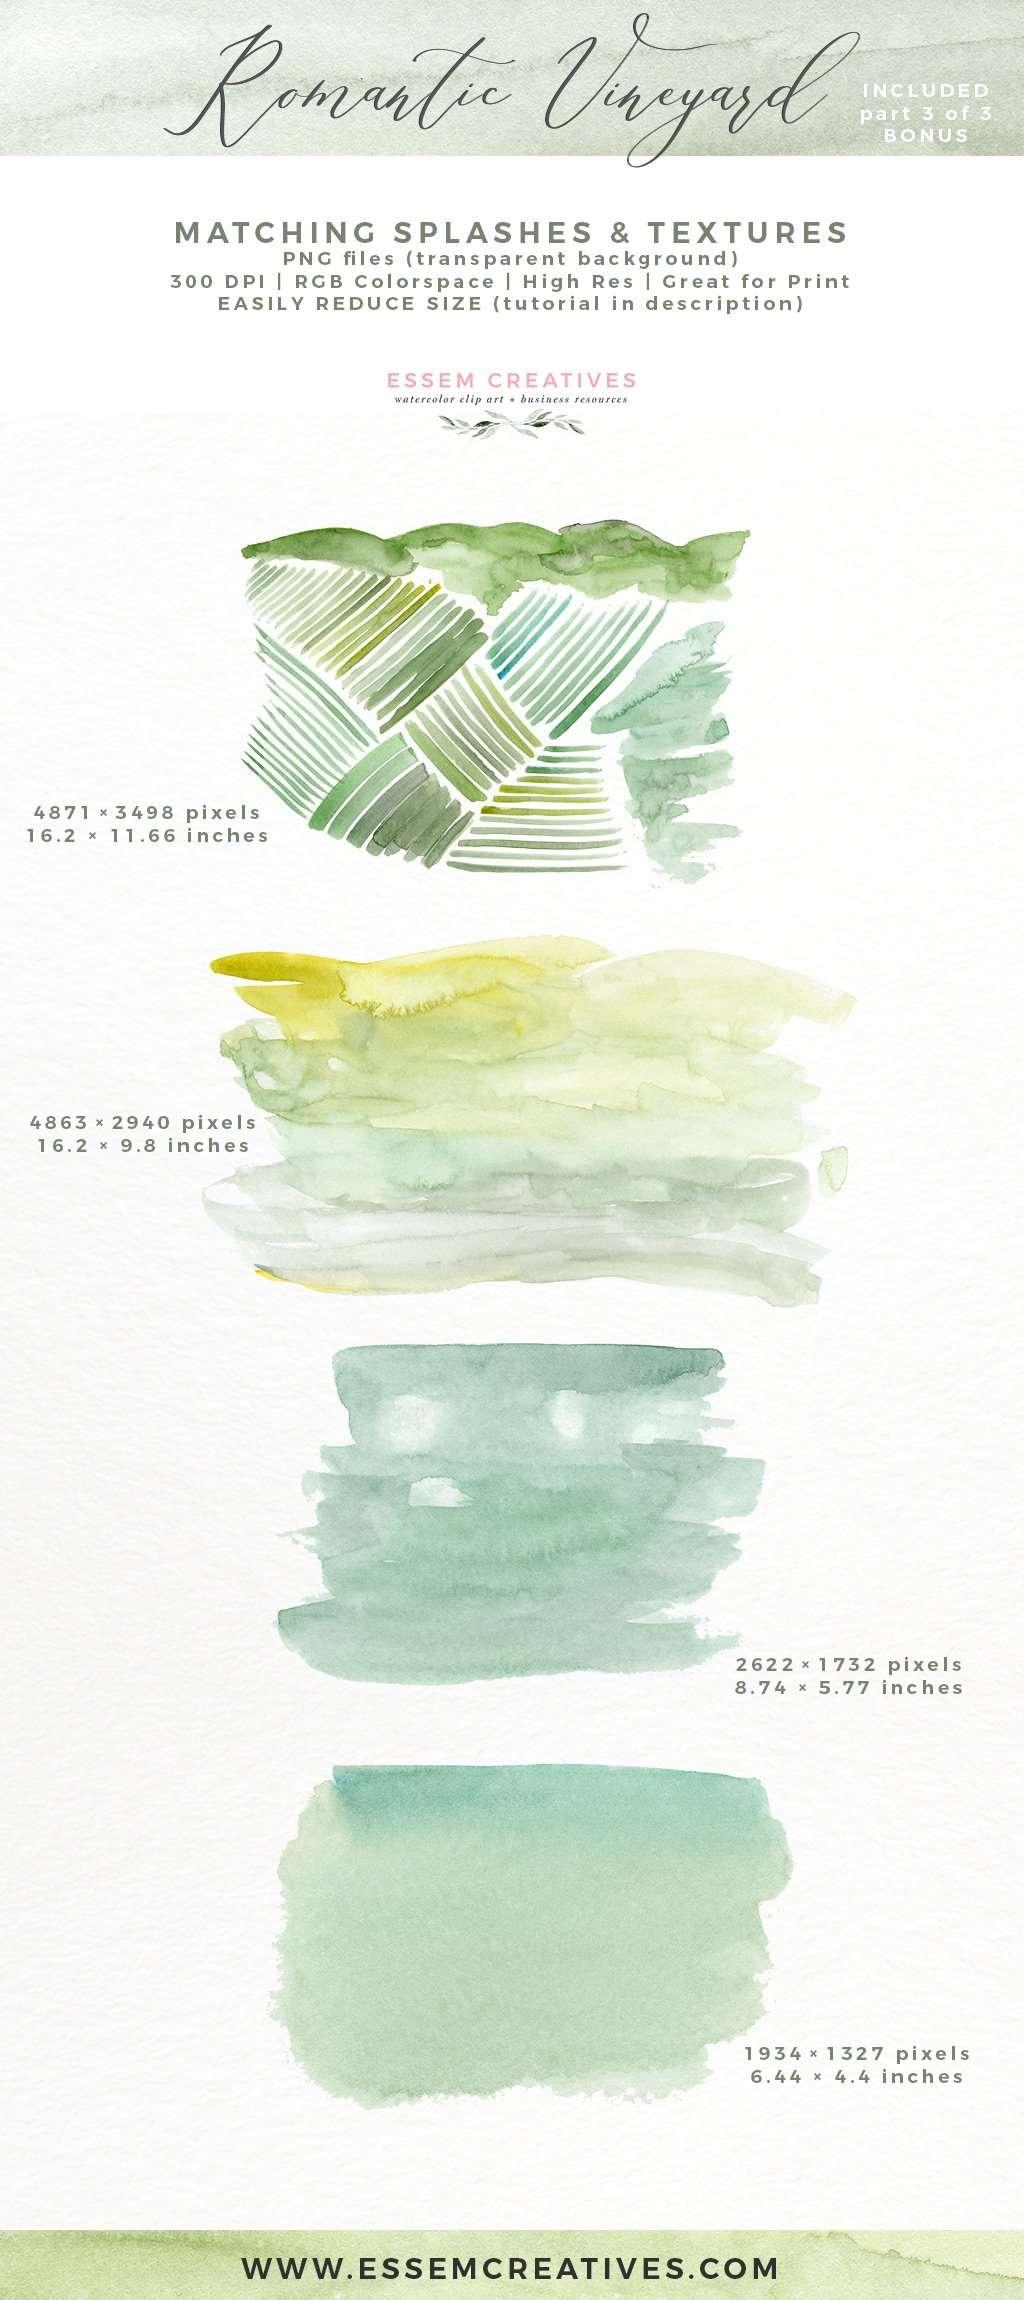 Watercolor Vineyard Landscape Wedding Invitation Clipart | Essem ...